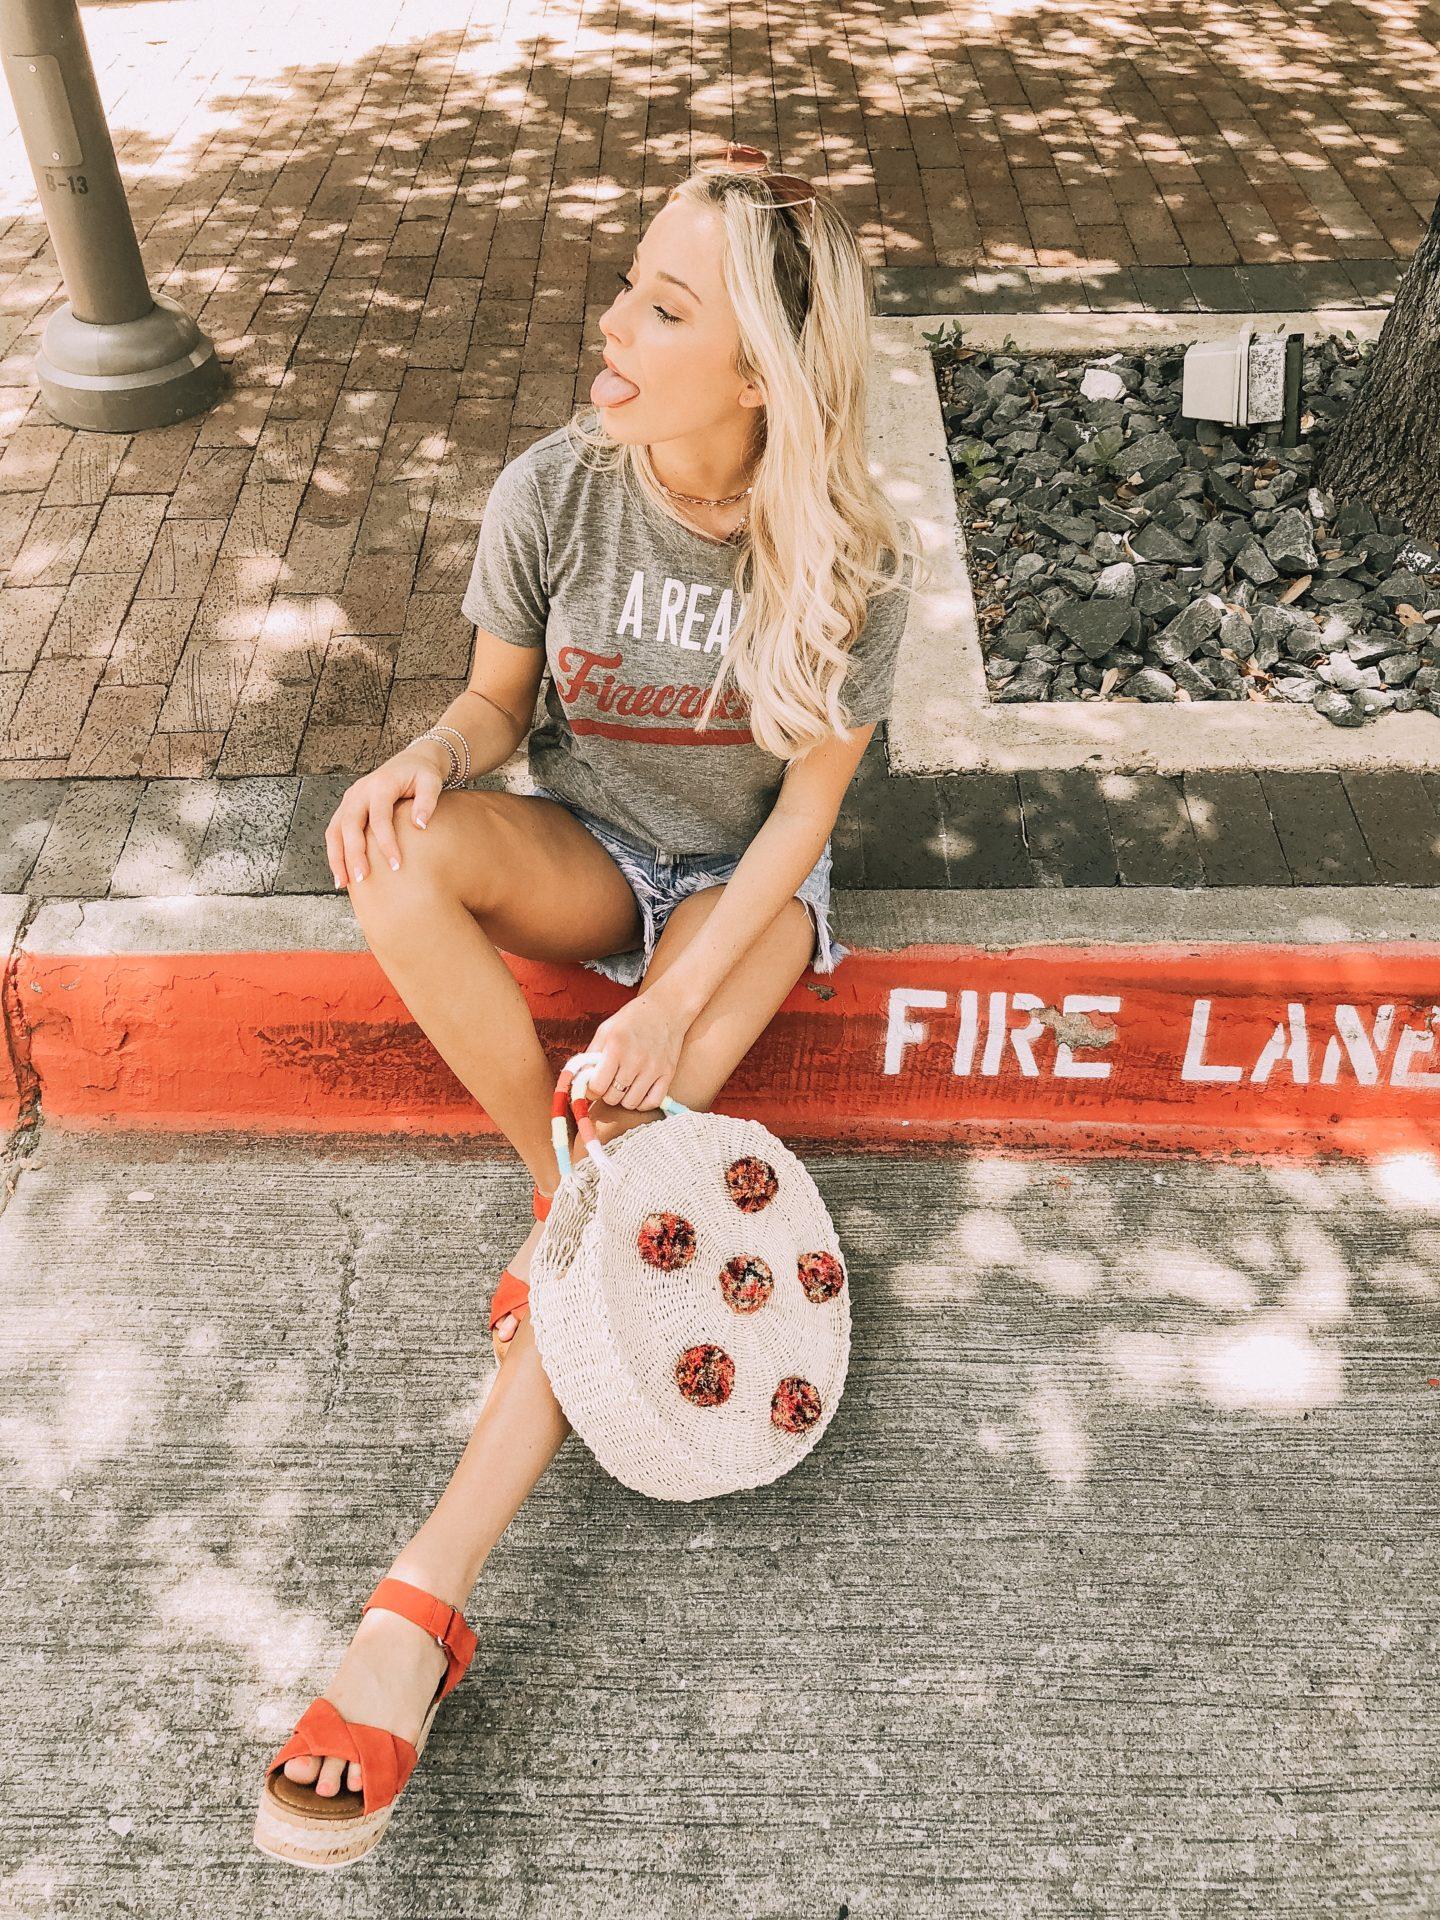 Firecracker Shirt - Dallas Fashion Model, Fashion & Lifestyle Blogger - Peyton Mabry